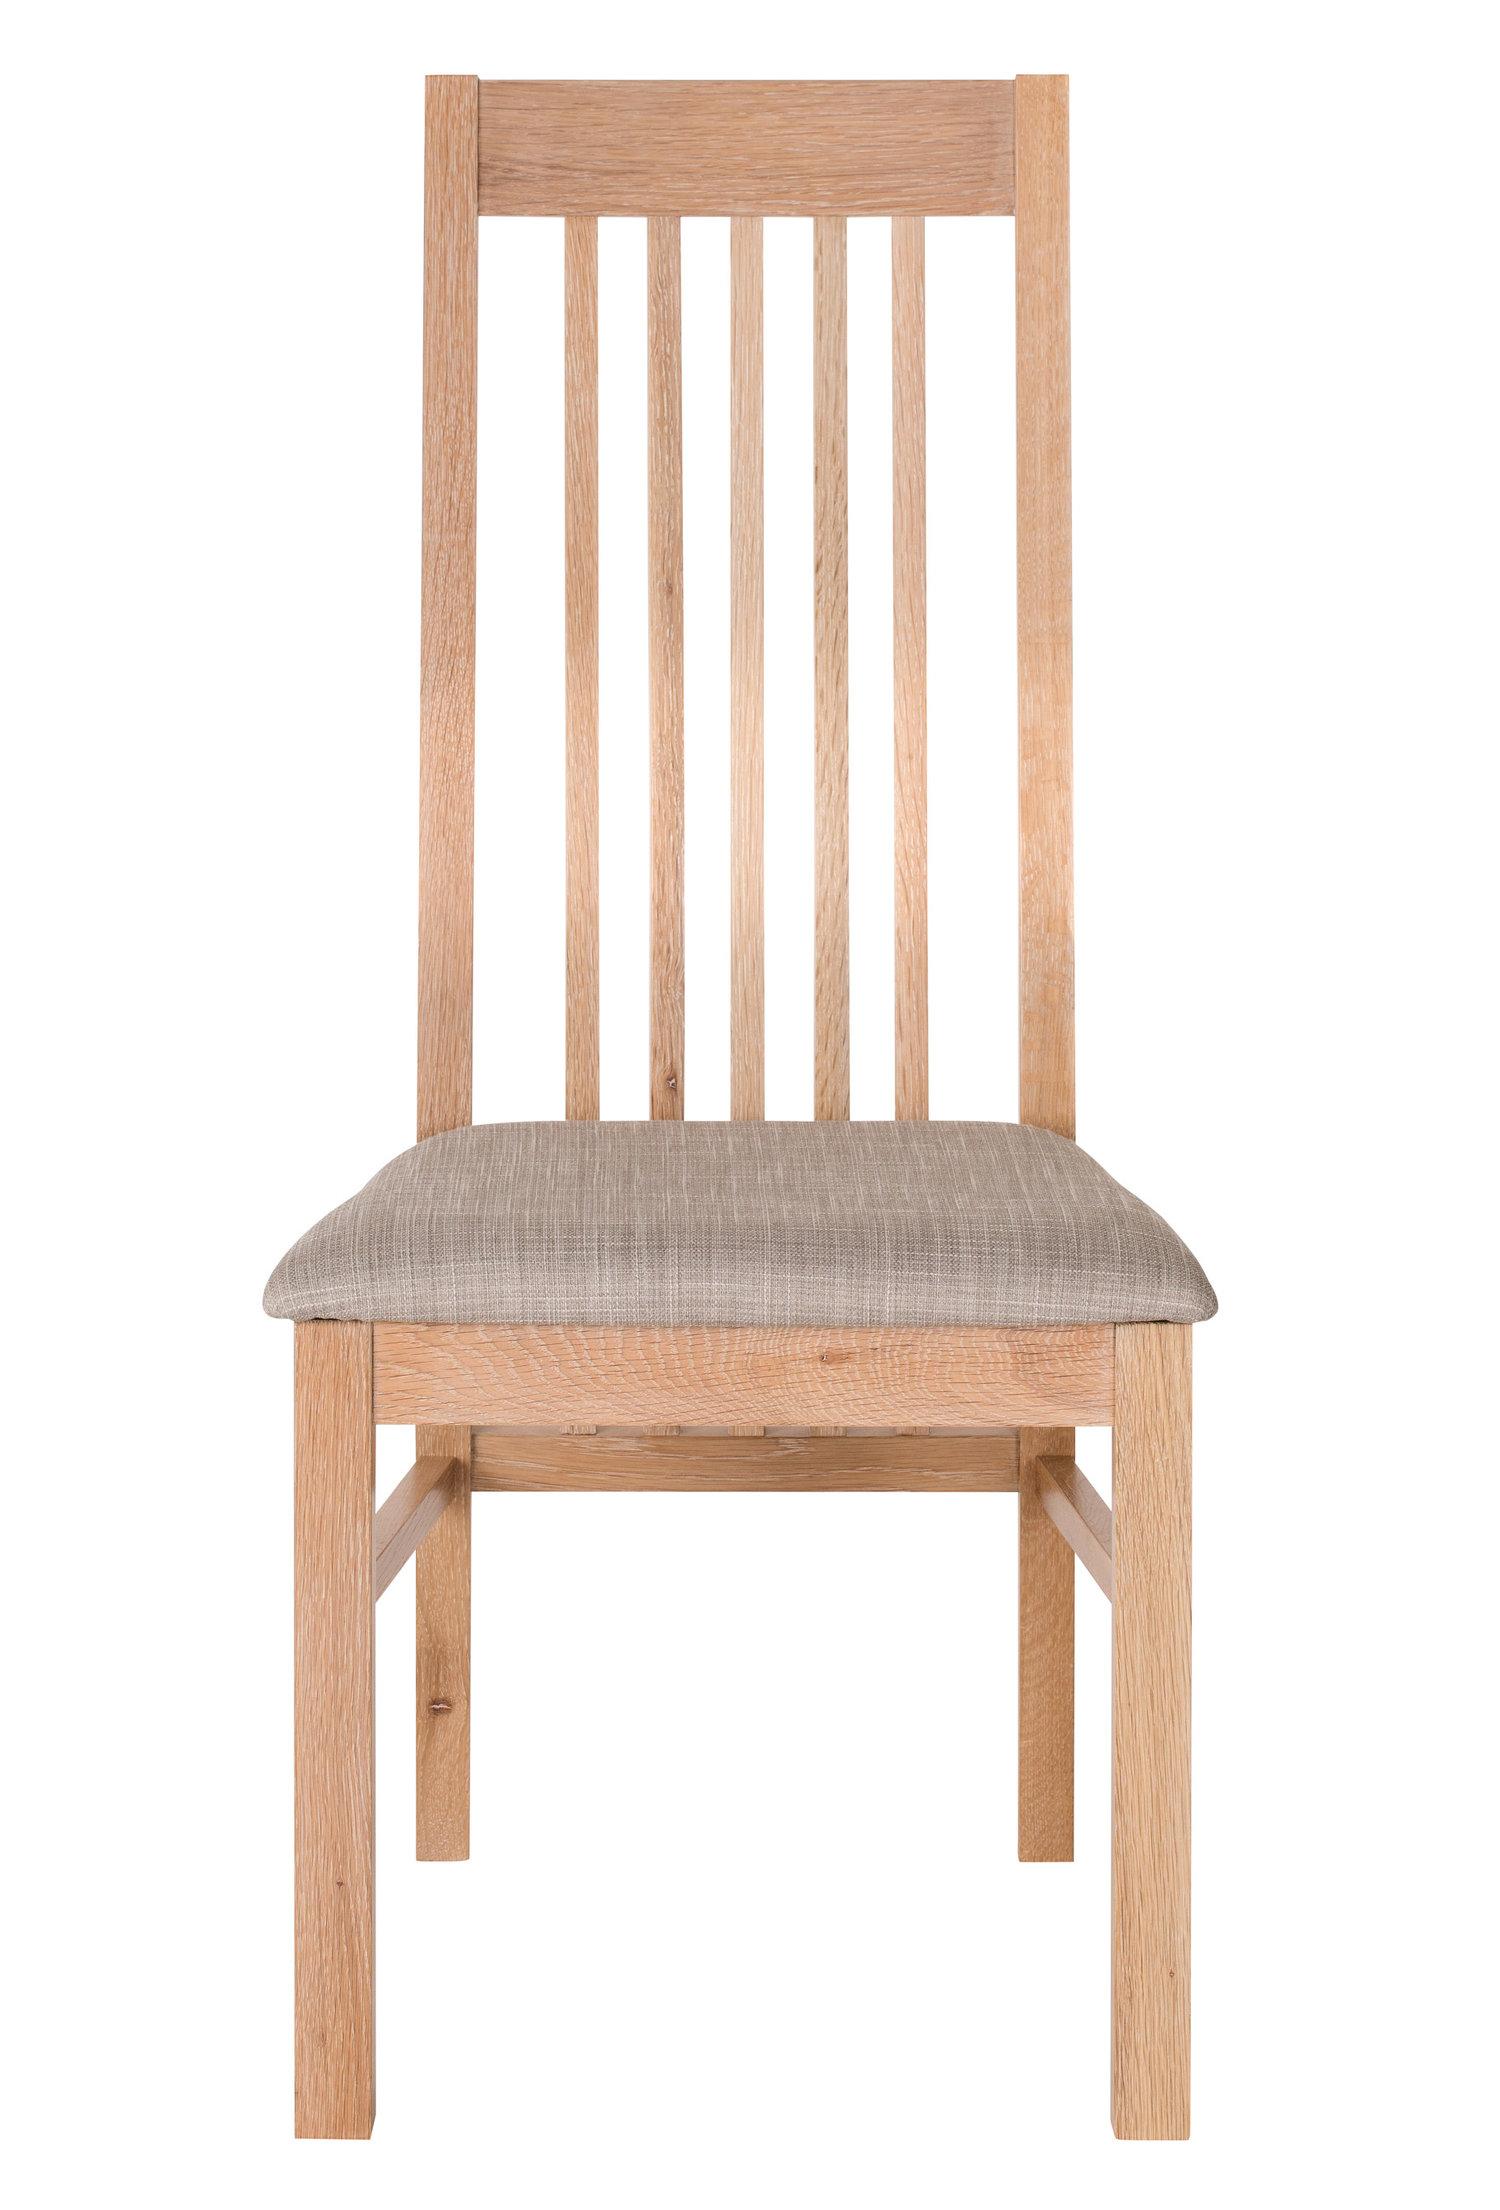 Simple_Furniture_product_TBP_7.jpg